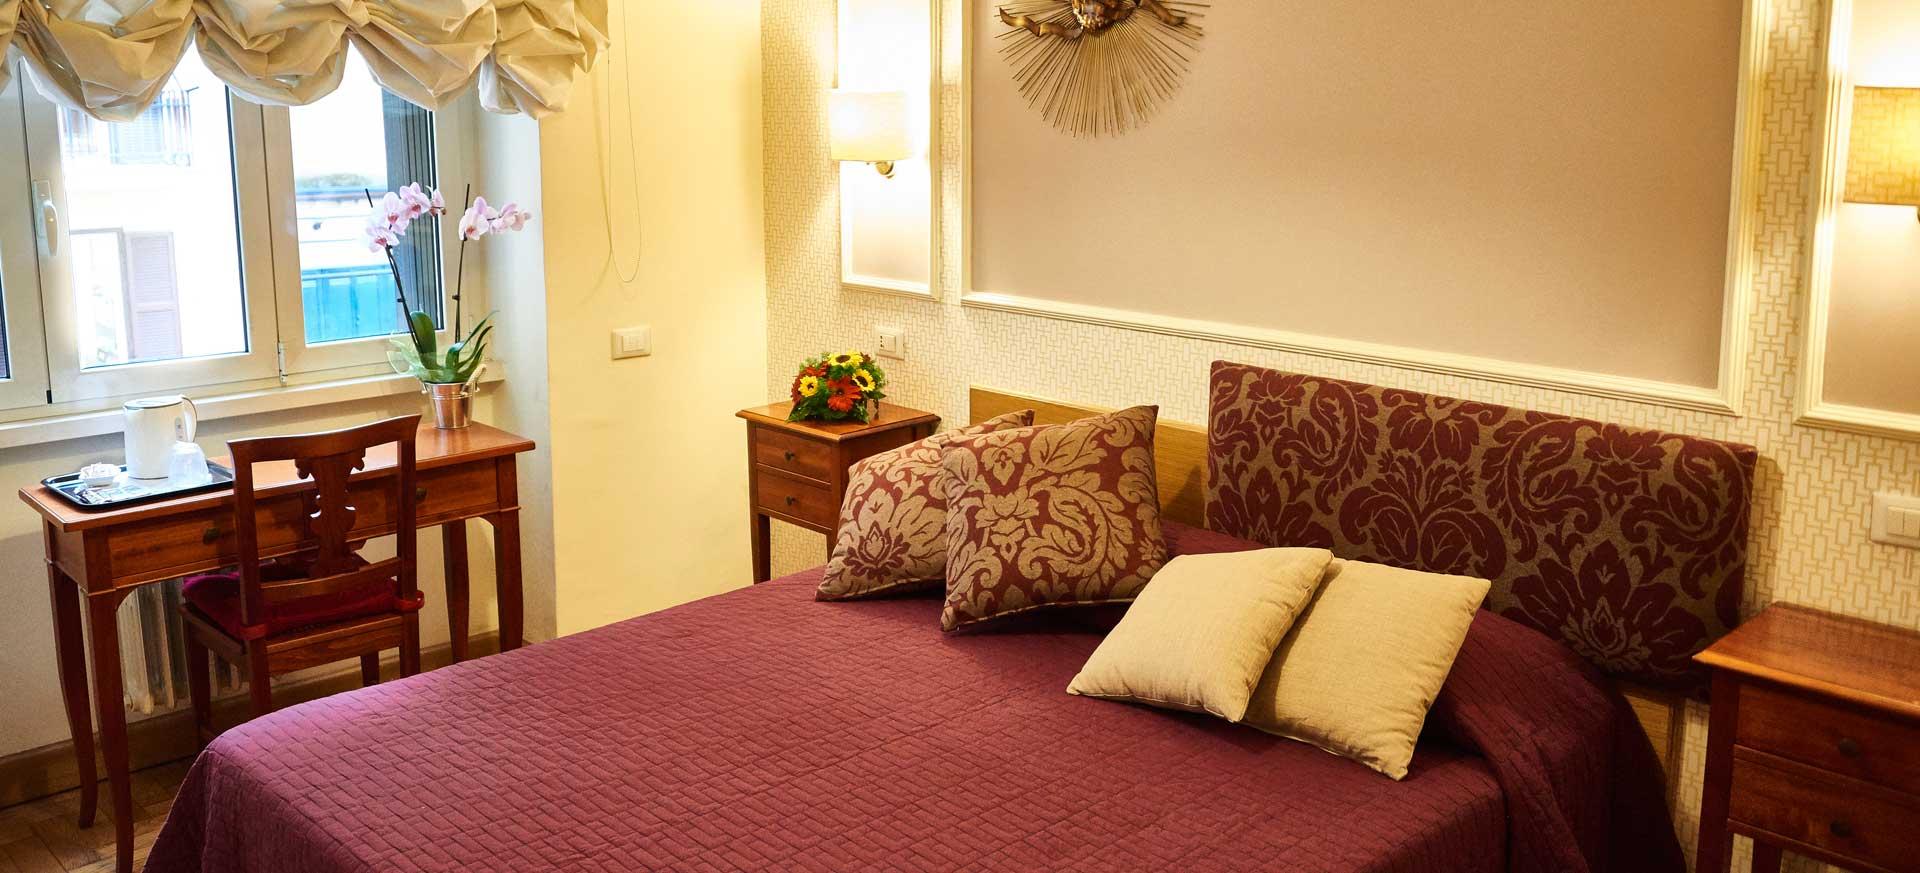 chambre d 39 h te rome vatican hote italia. Black Bedroom Furniture Sets. Home Design Ideas